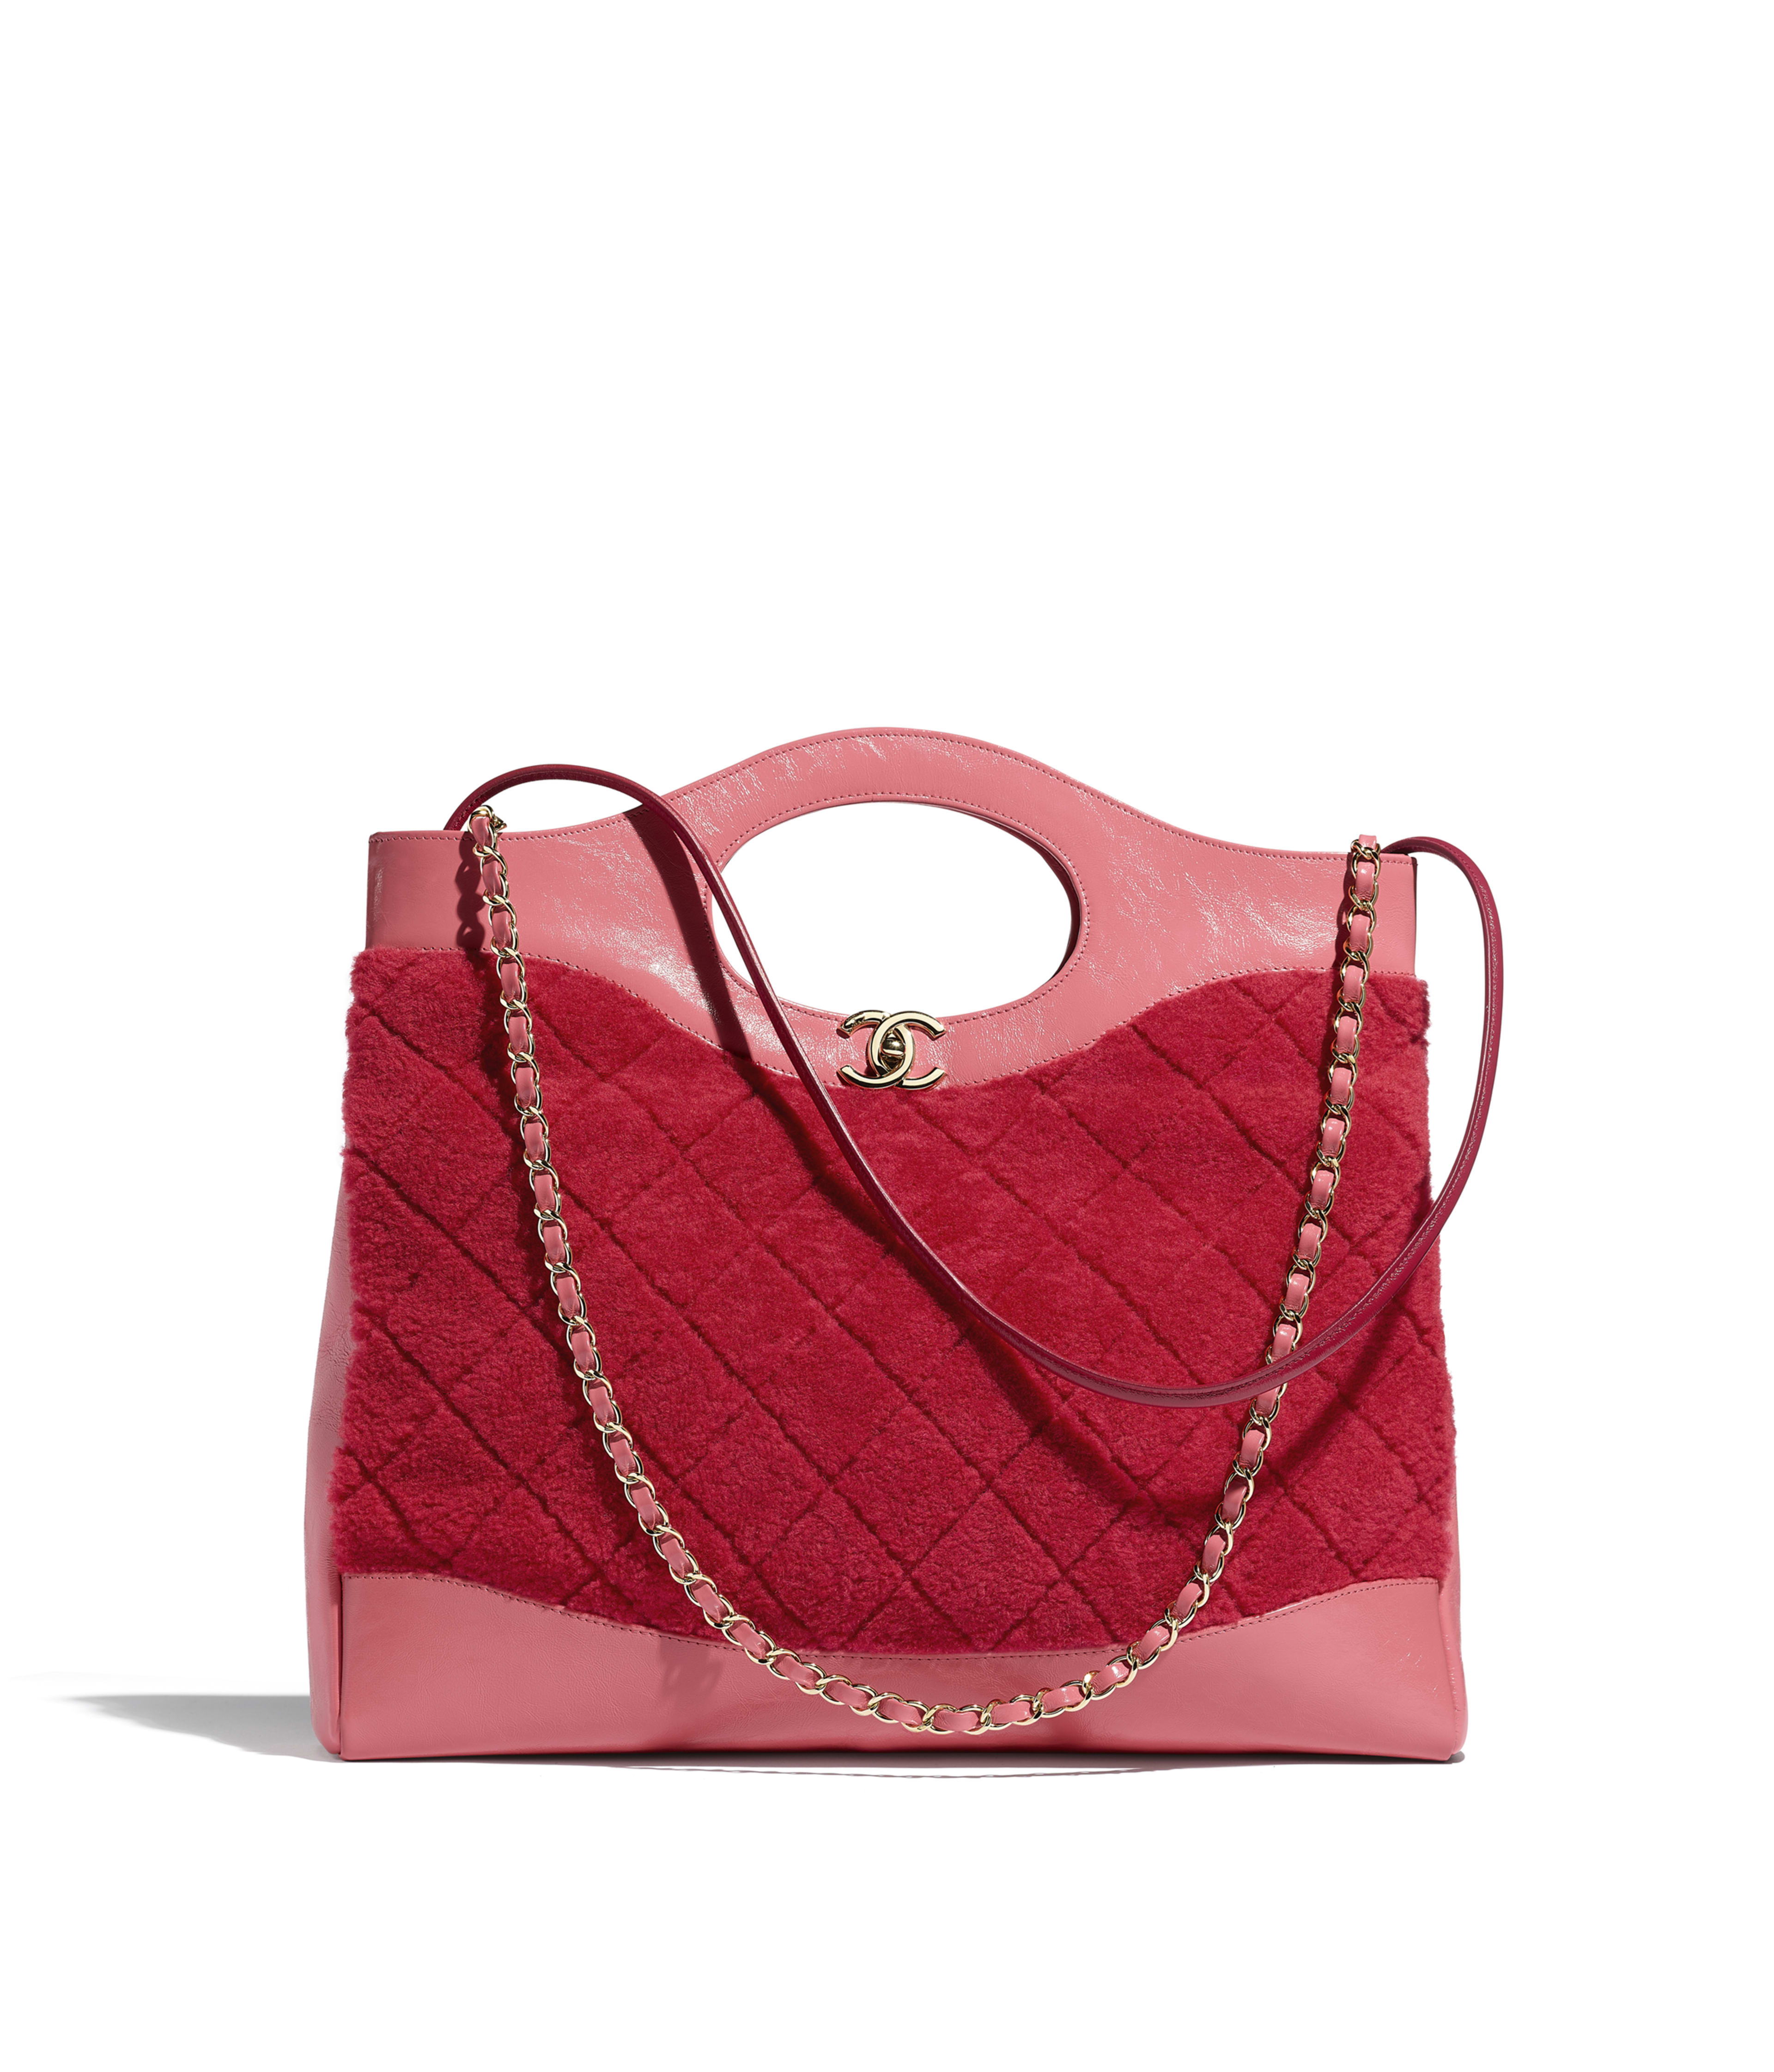 6ceb43bad4394 CHANEL 31 Shopping Bag Shearling Sheepskin, Calfskin & Gold-Tone Metal, Red  & Pink Ref. AS1010B01212N0437